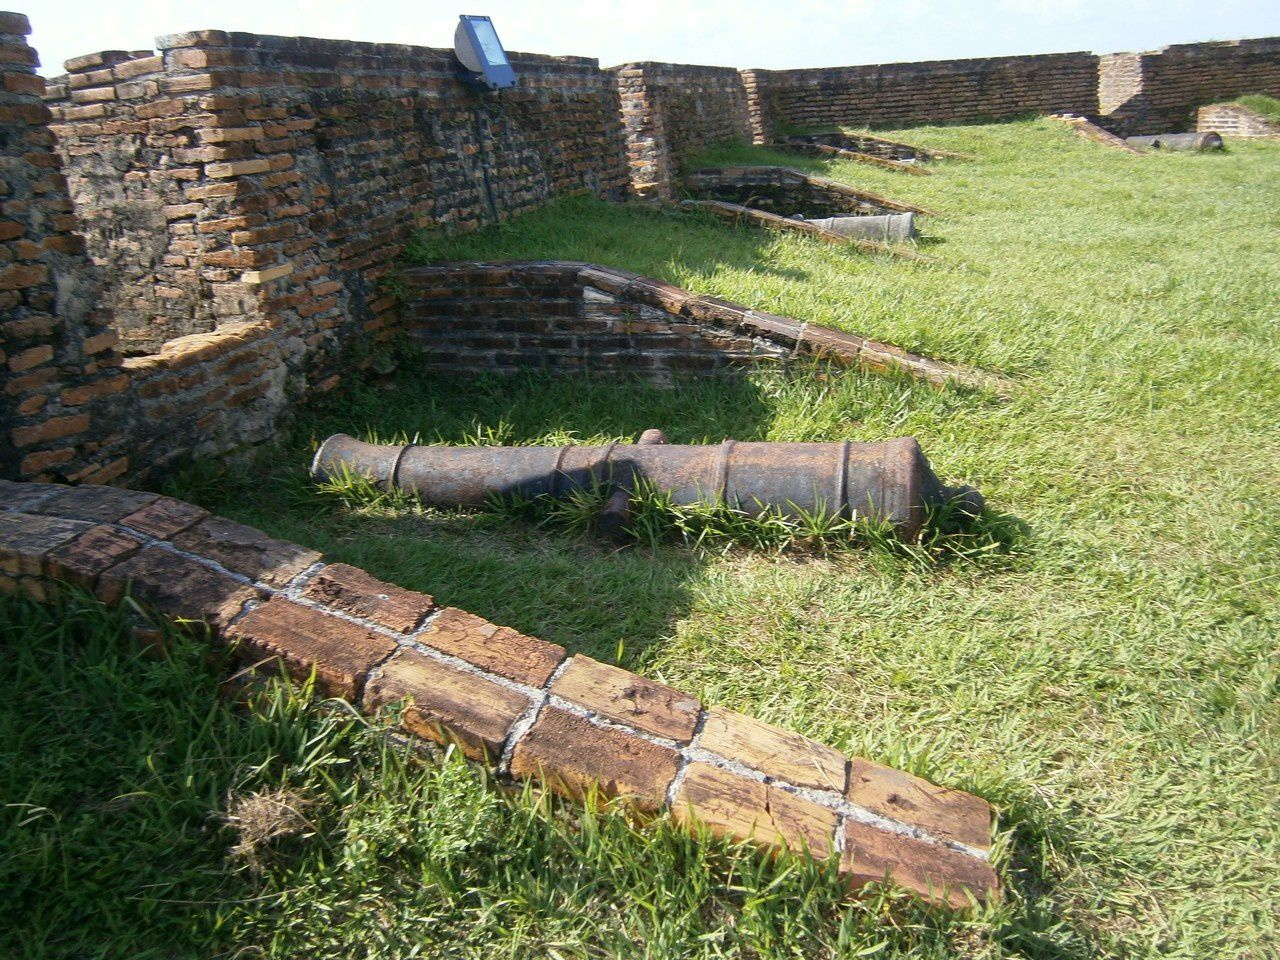 le fort Sao José de Macapa